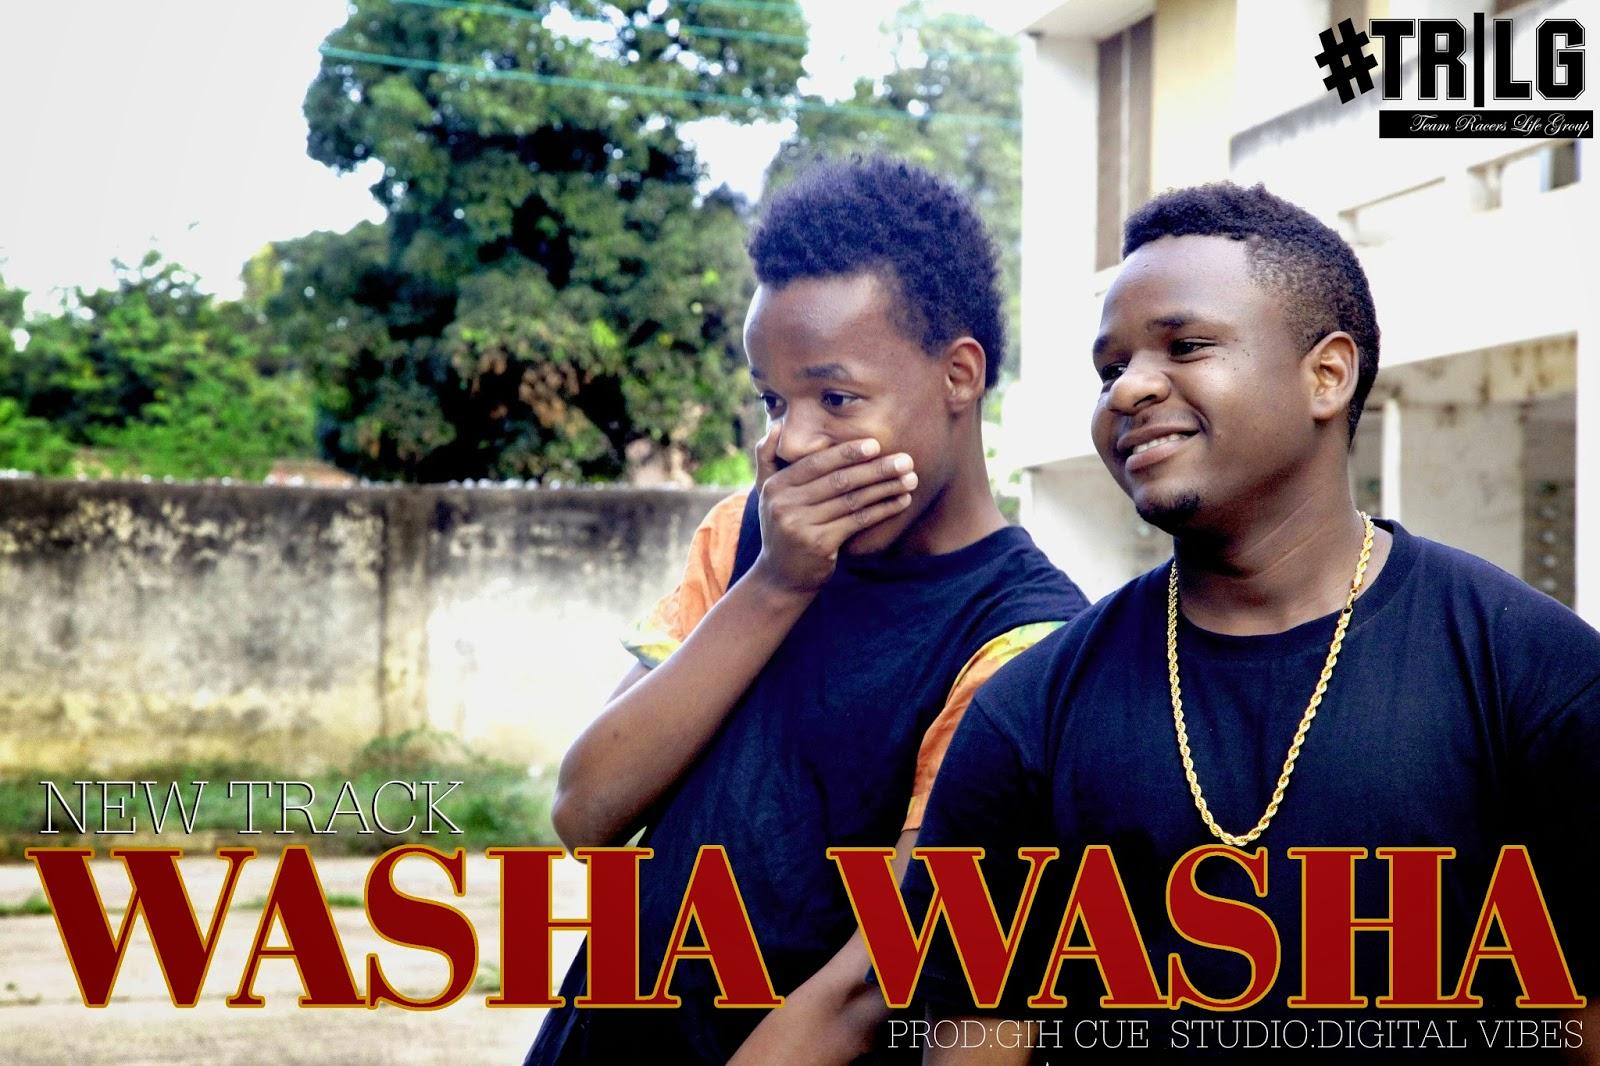 Download  Team Racerz  Washa Washa [Audio]  NOLNIZ # Wasbak Washok_104333